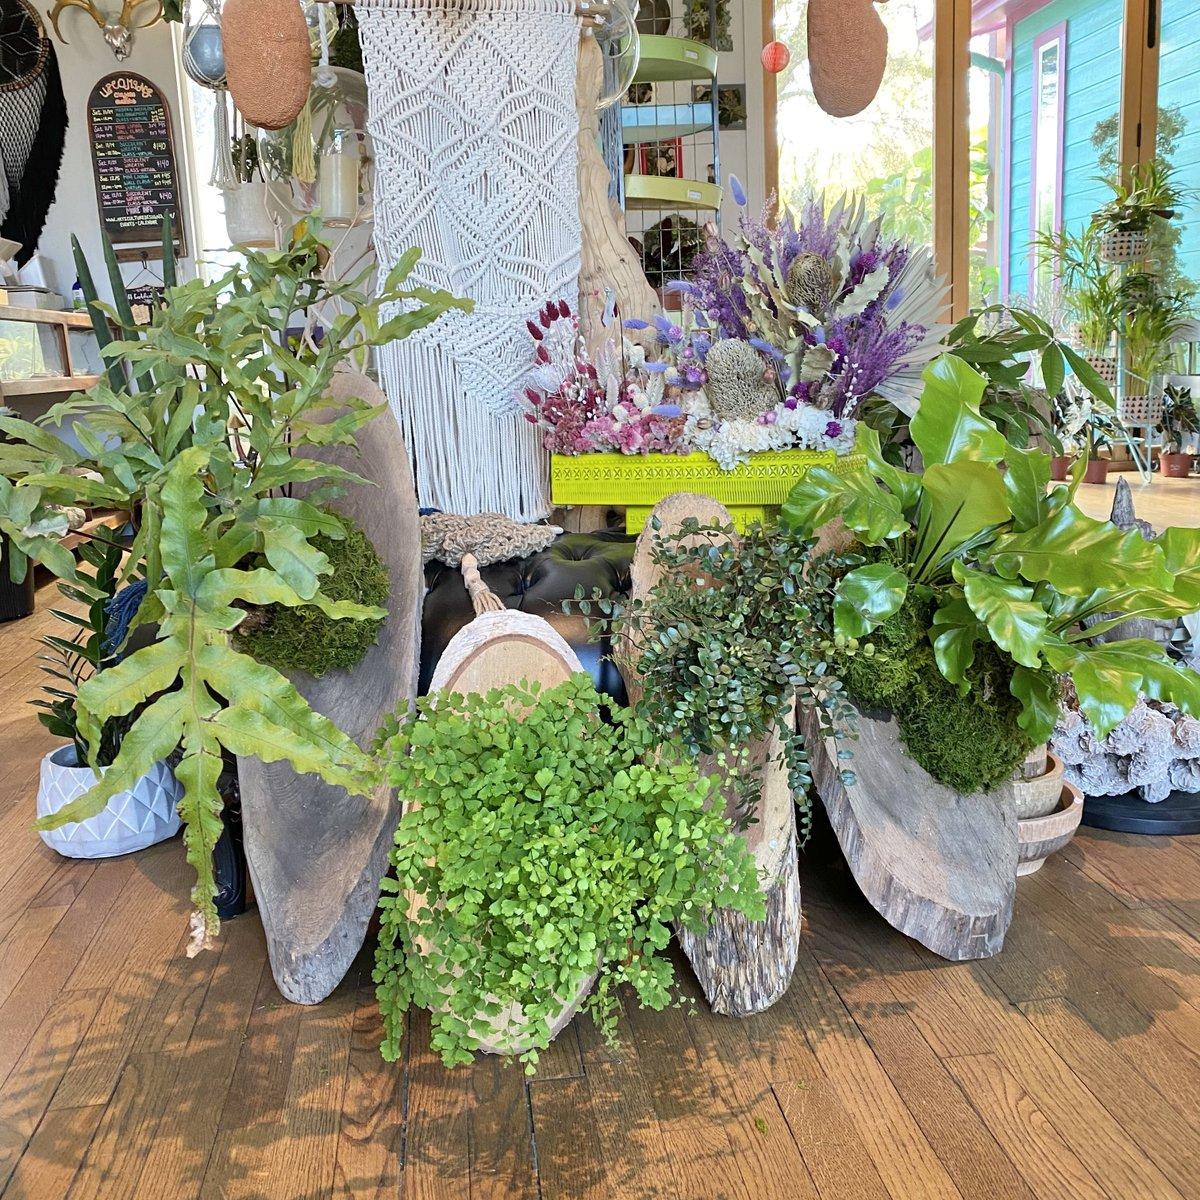 I'll take mine mounted💚  . . #mountedplants #plantpeople #plantparty #plantlover #plantsplantsplants #plantsmakepeoplehappy #plantlife #govertical #ferns #plantcollector #plantenthusiast #artisalive